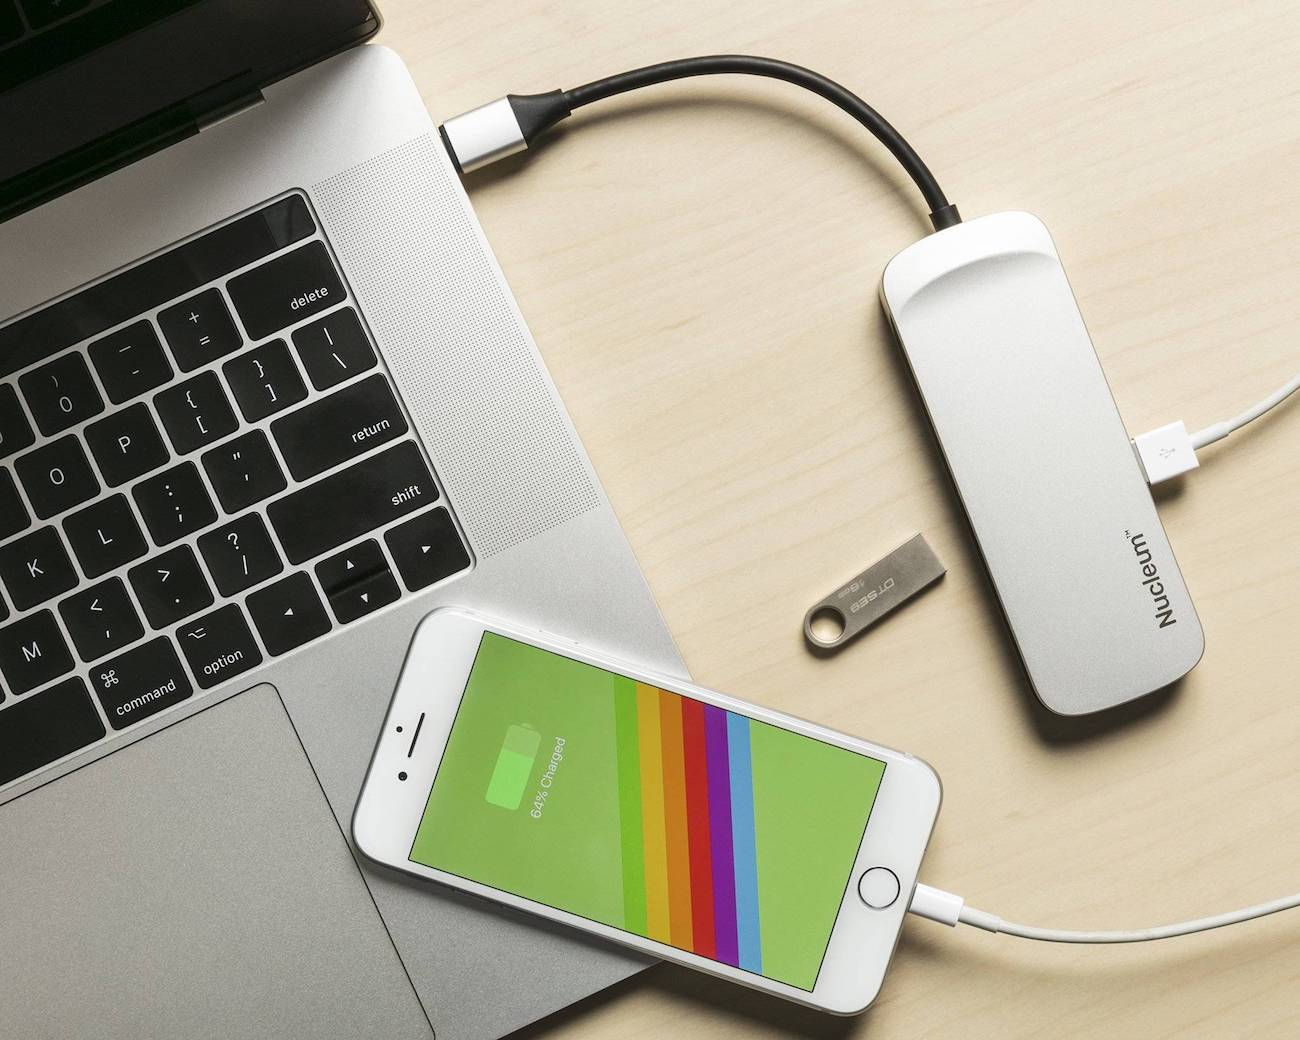 Kingston Nucleum USB Type-C Hub 03